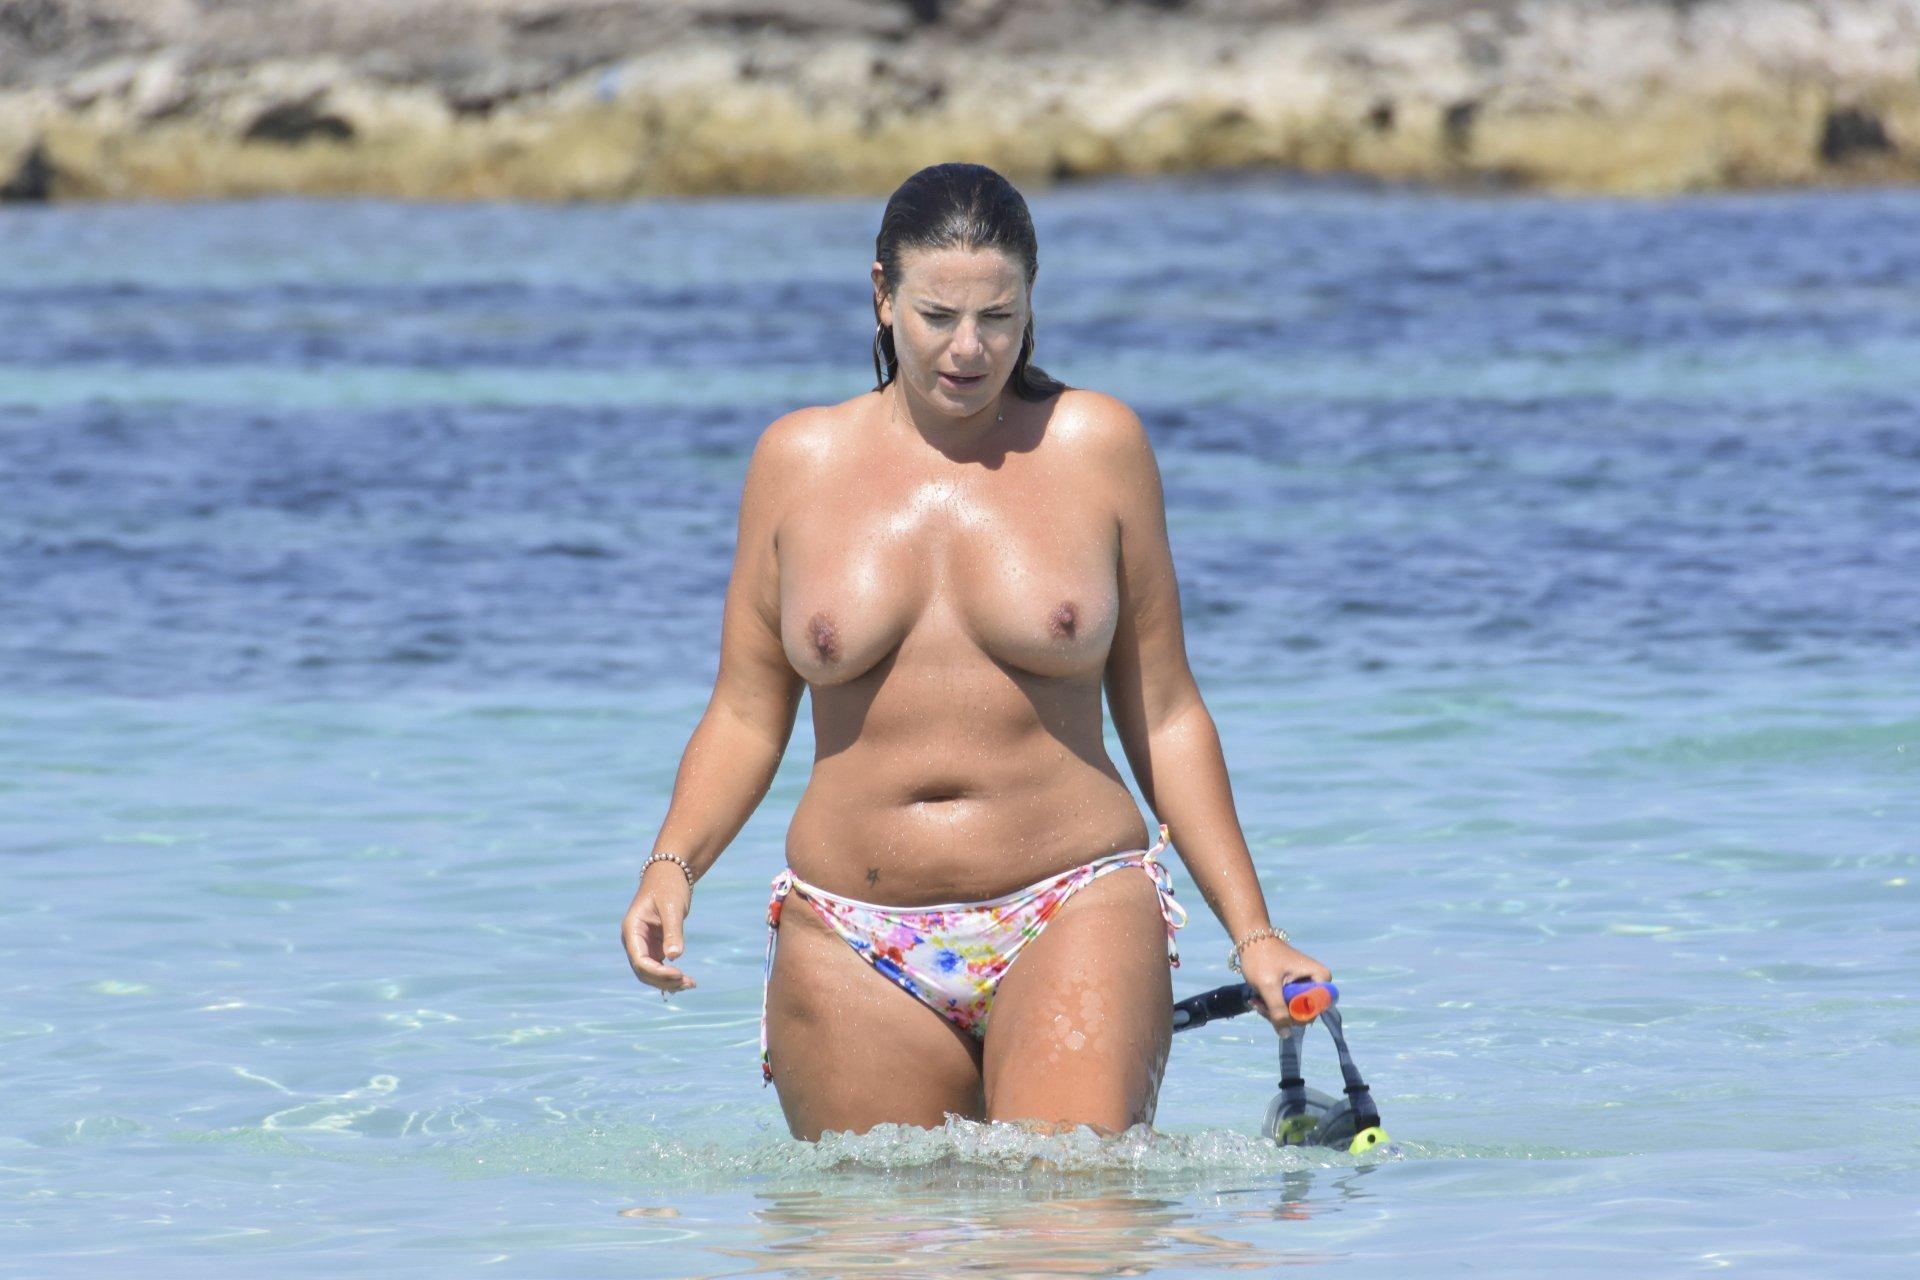 Fiona-Falkiner-Topless-TheFappeningBlog.com-3.jpg